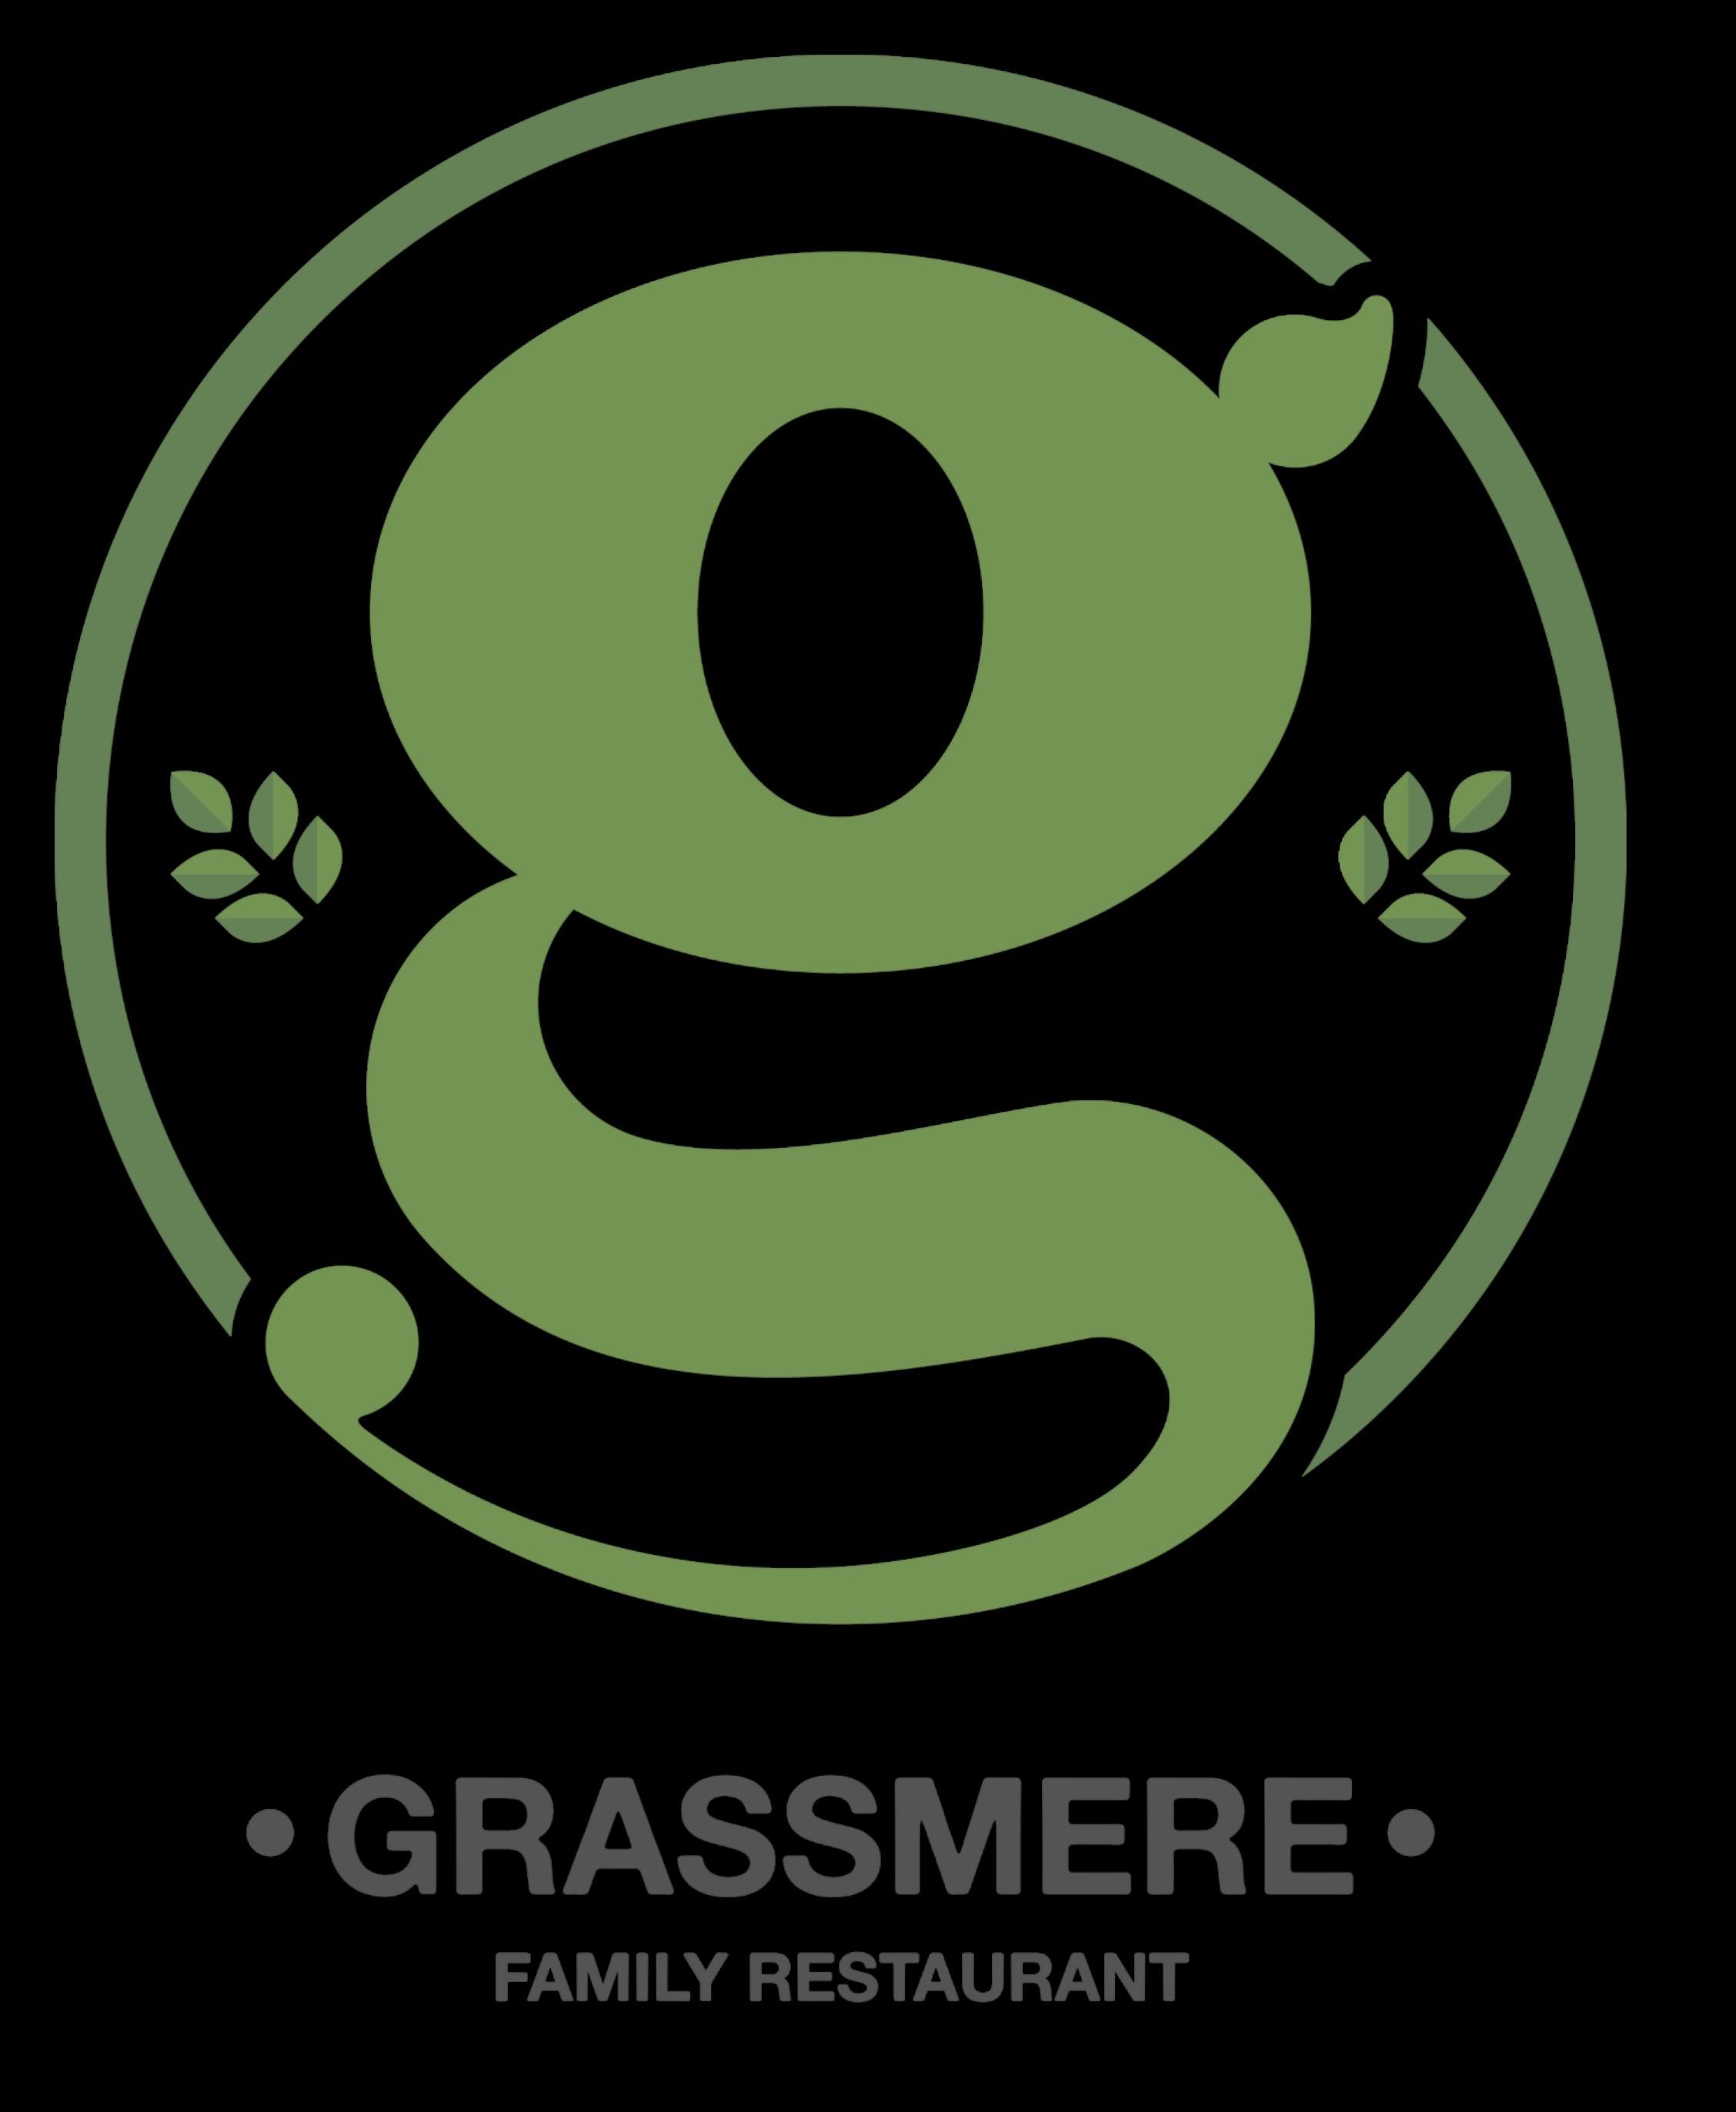 Grassmere.png